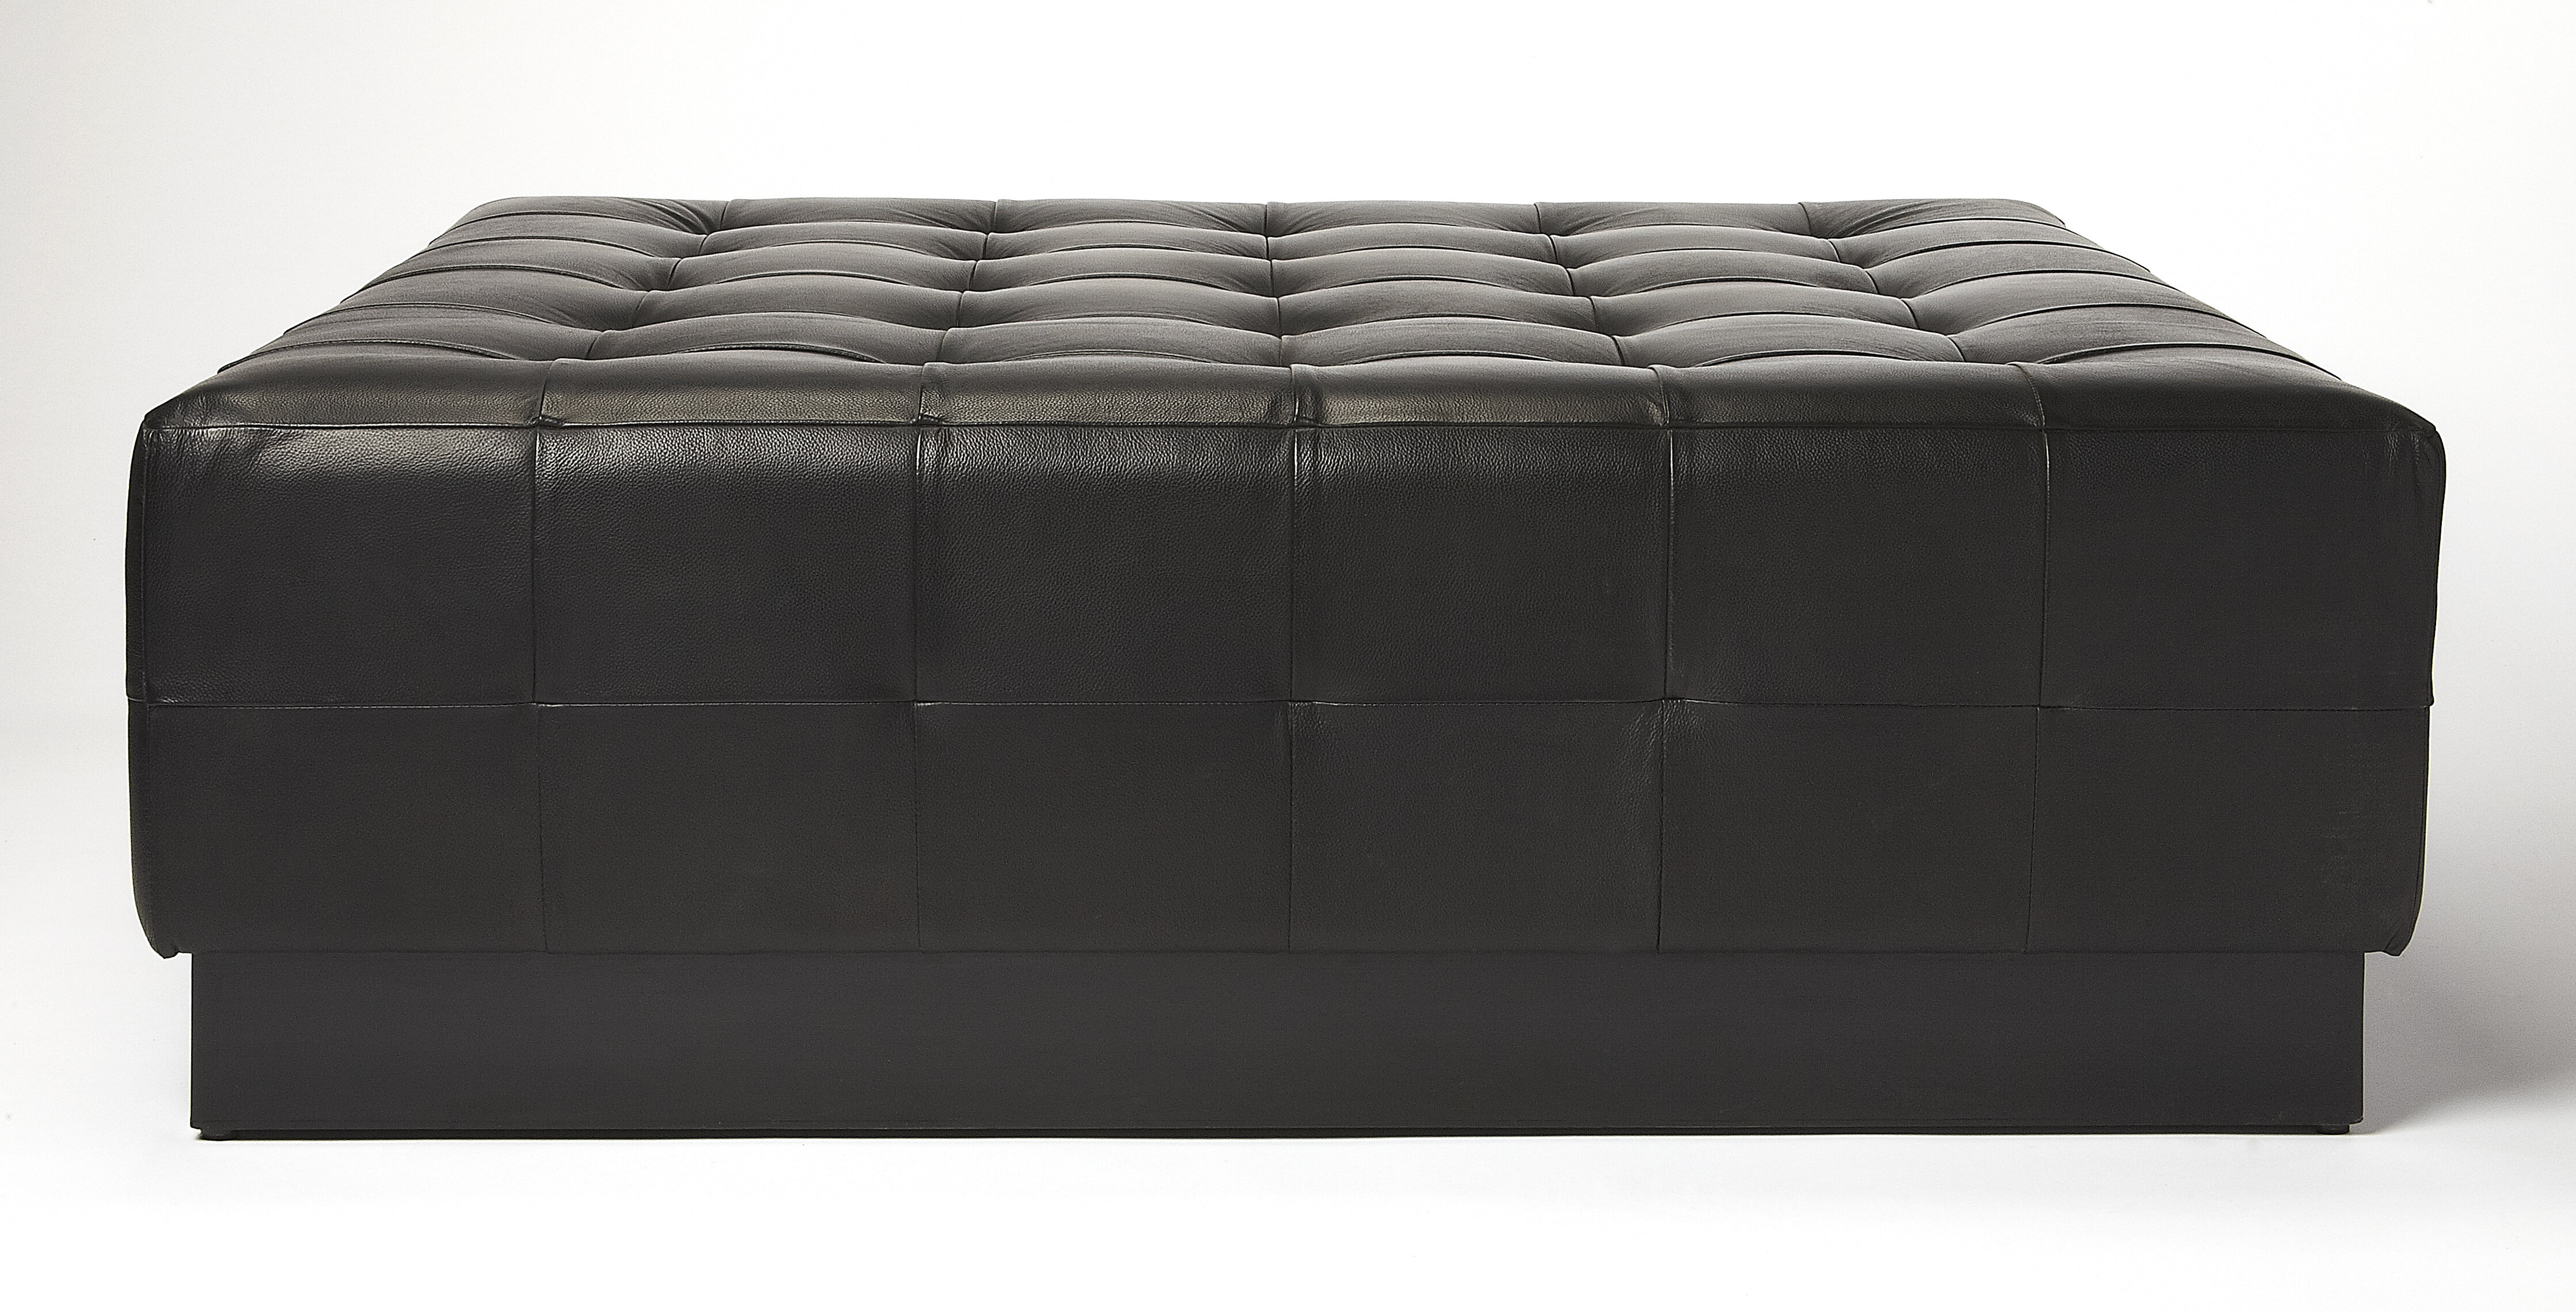 Remarkable Canora Grey Doris Leather Tufted Cocktail Ottoman Wayfair Cjindustries Chair Design For Home Cjindustriesco